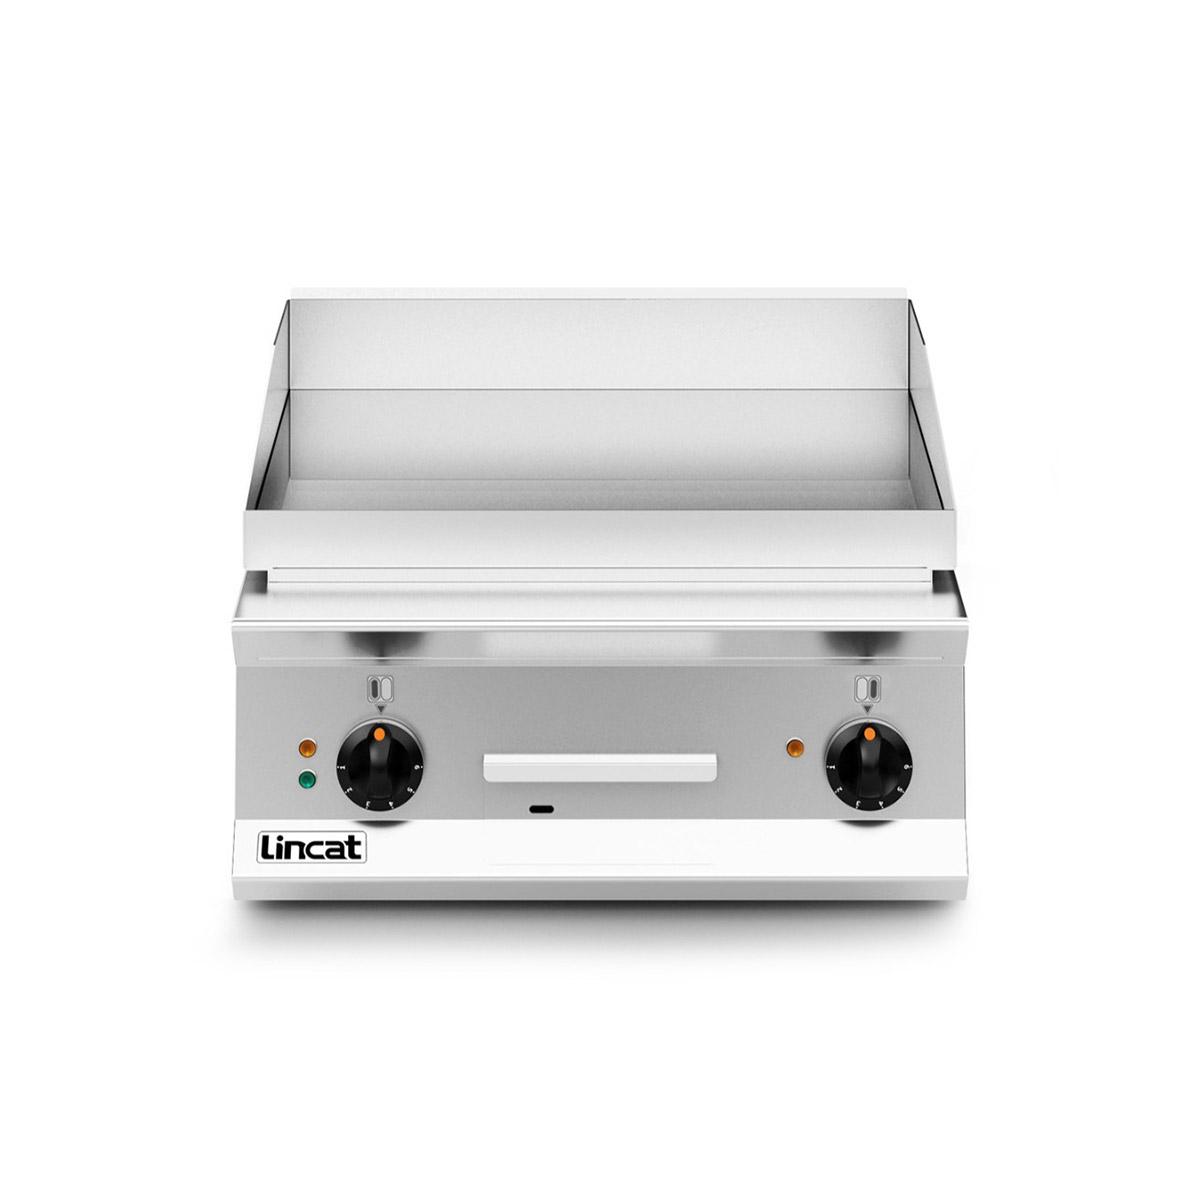 Lincat Opus 800 Chrome Plate Electric Griddle Model: OE8205/C